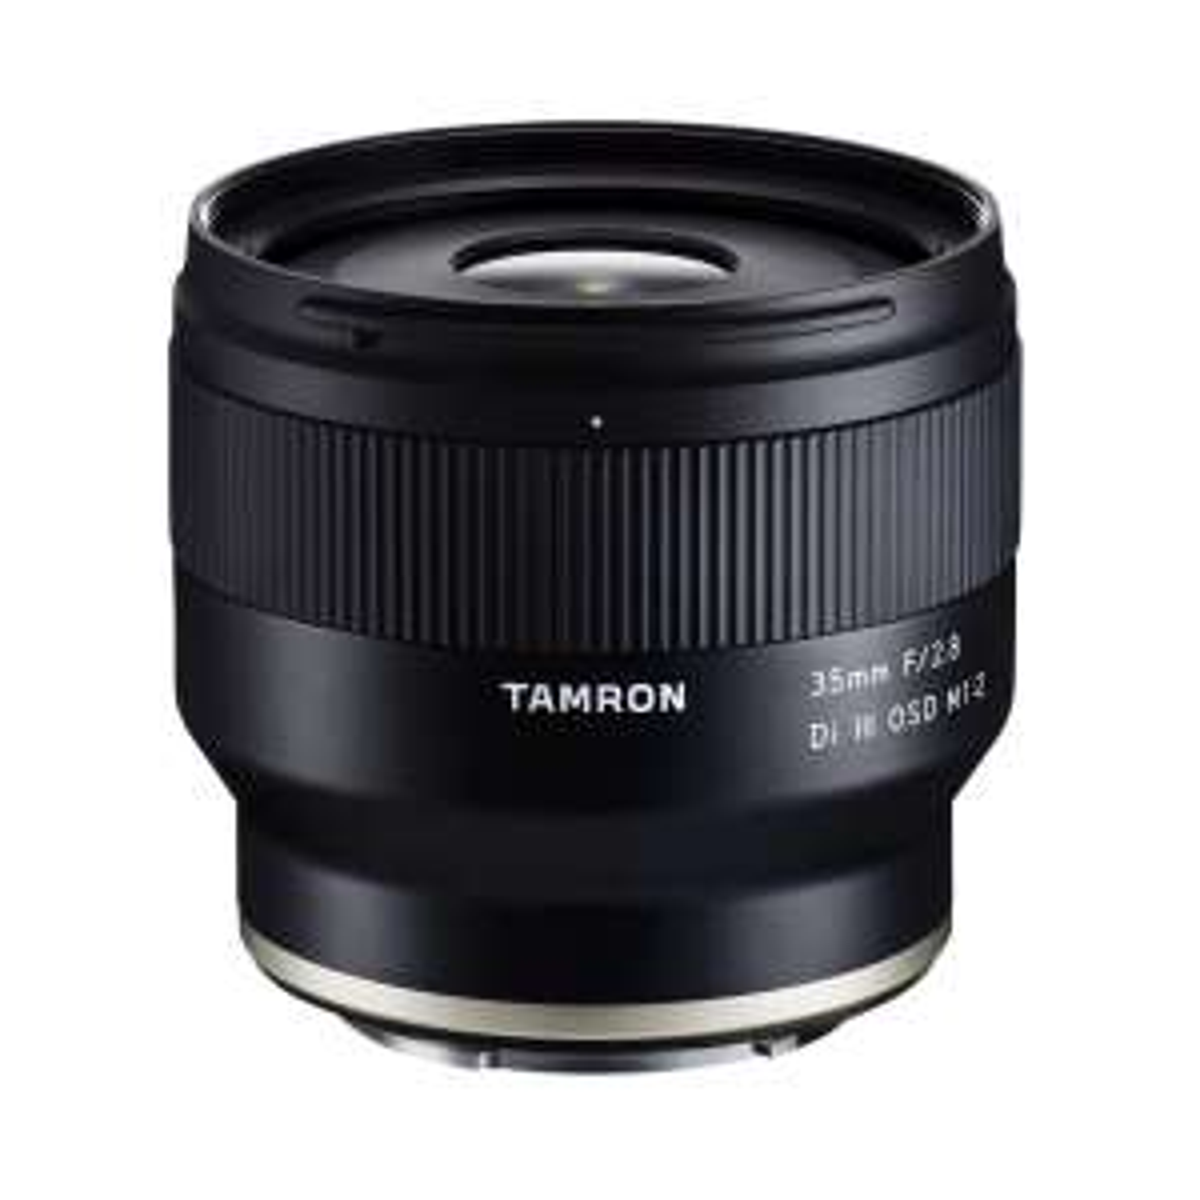 Tamron 35 mm 1:2,8 Di III OSD - Sony-FE-Mount & Tamron UV-Filter gratis